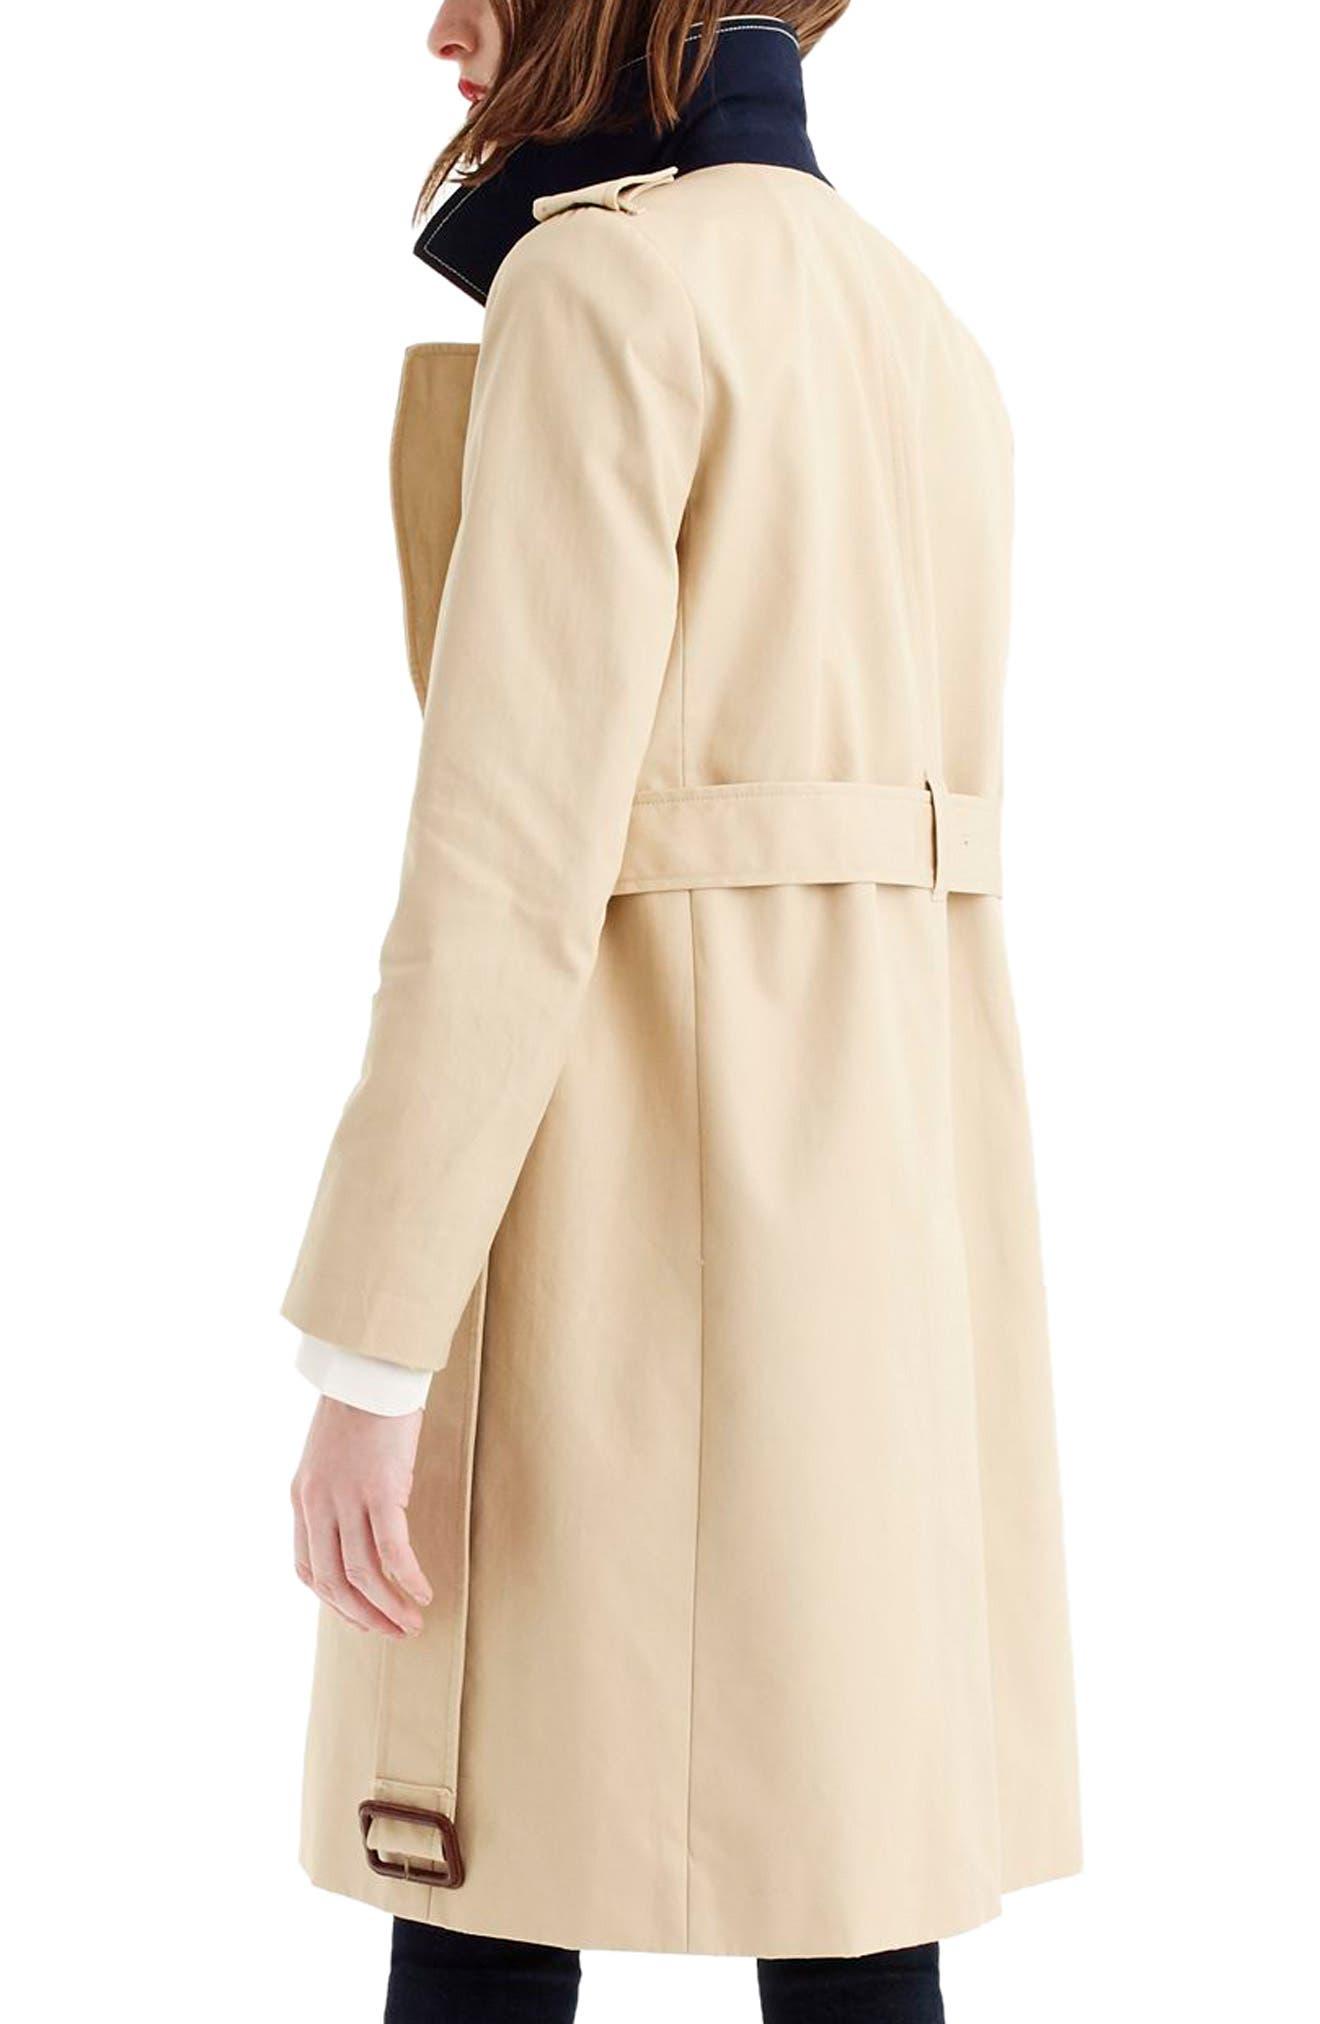 Dion Trench Coat,                             Alternate thumbnail 2, color,                             Vintage Khaki